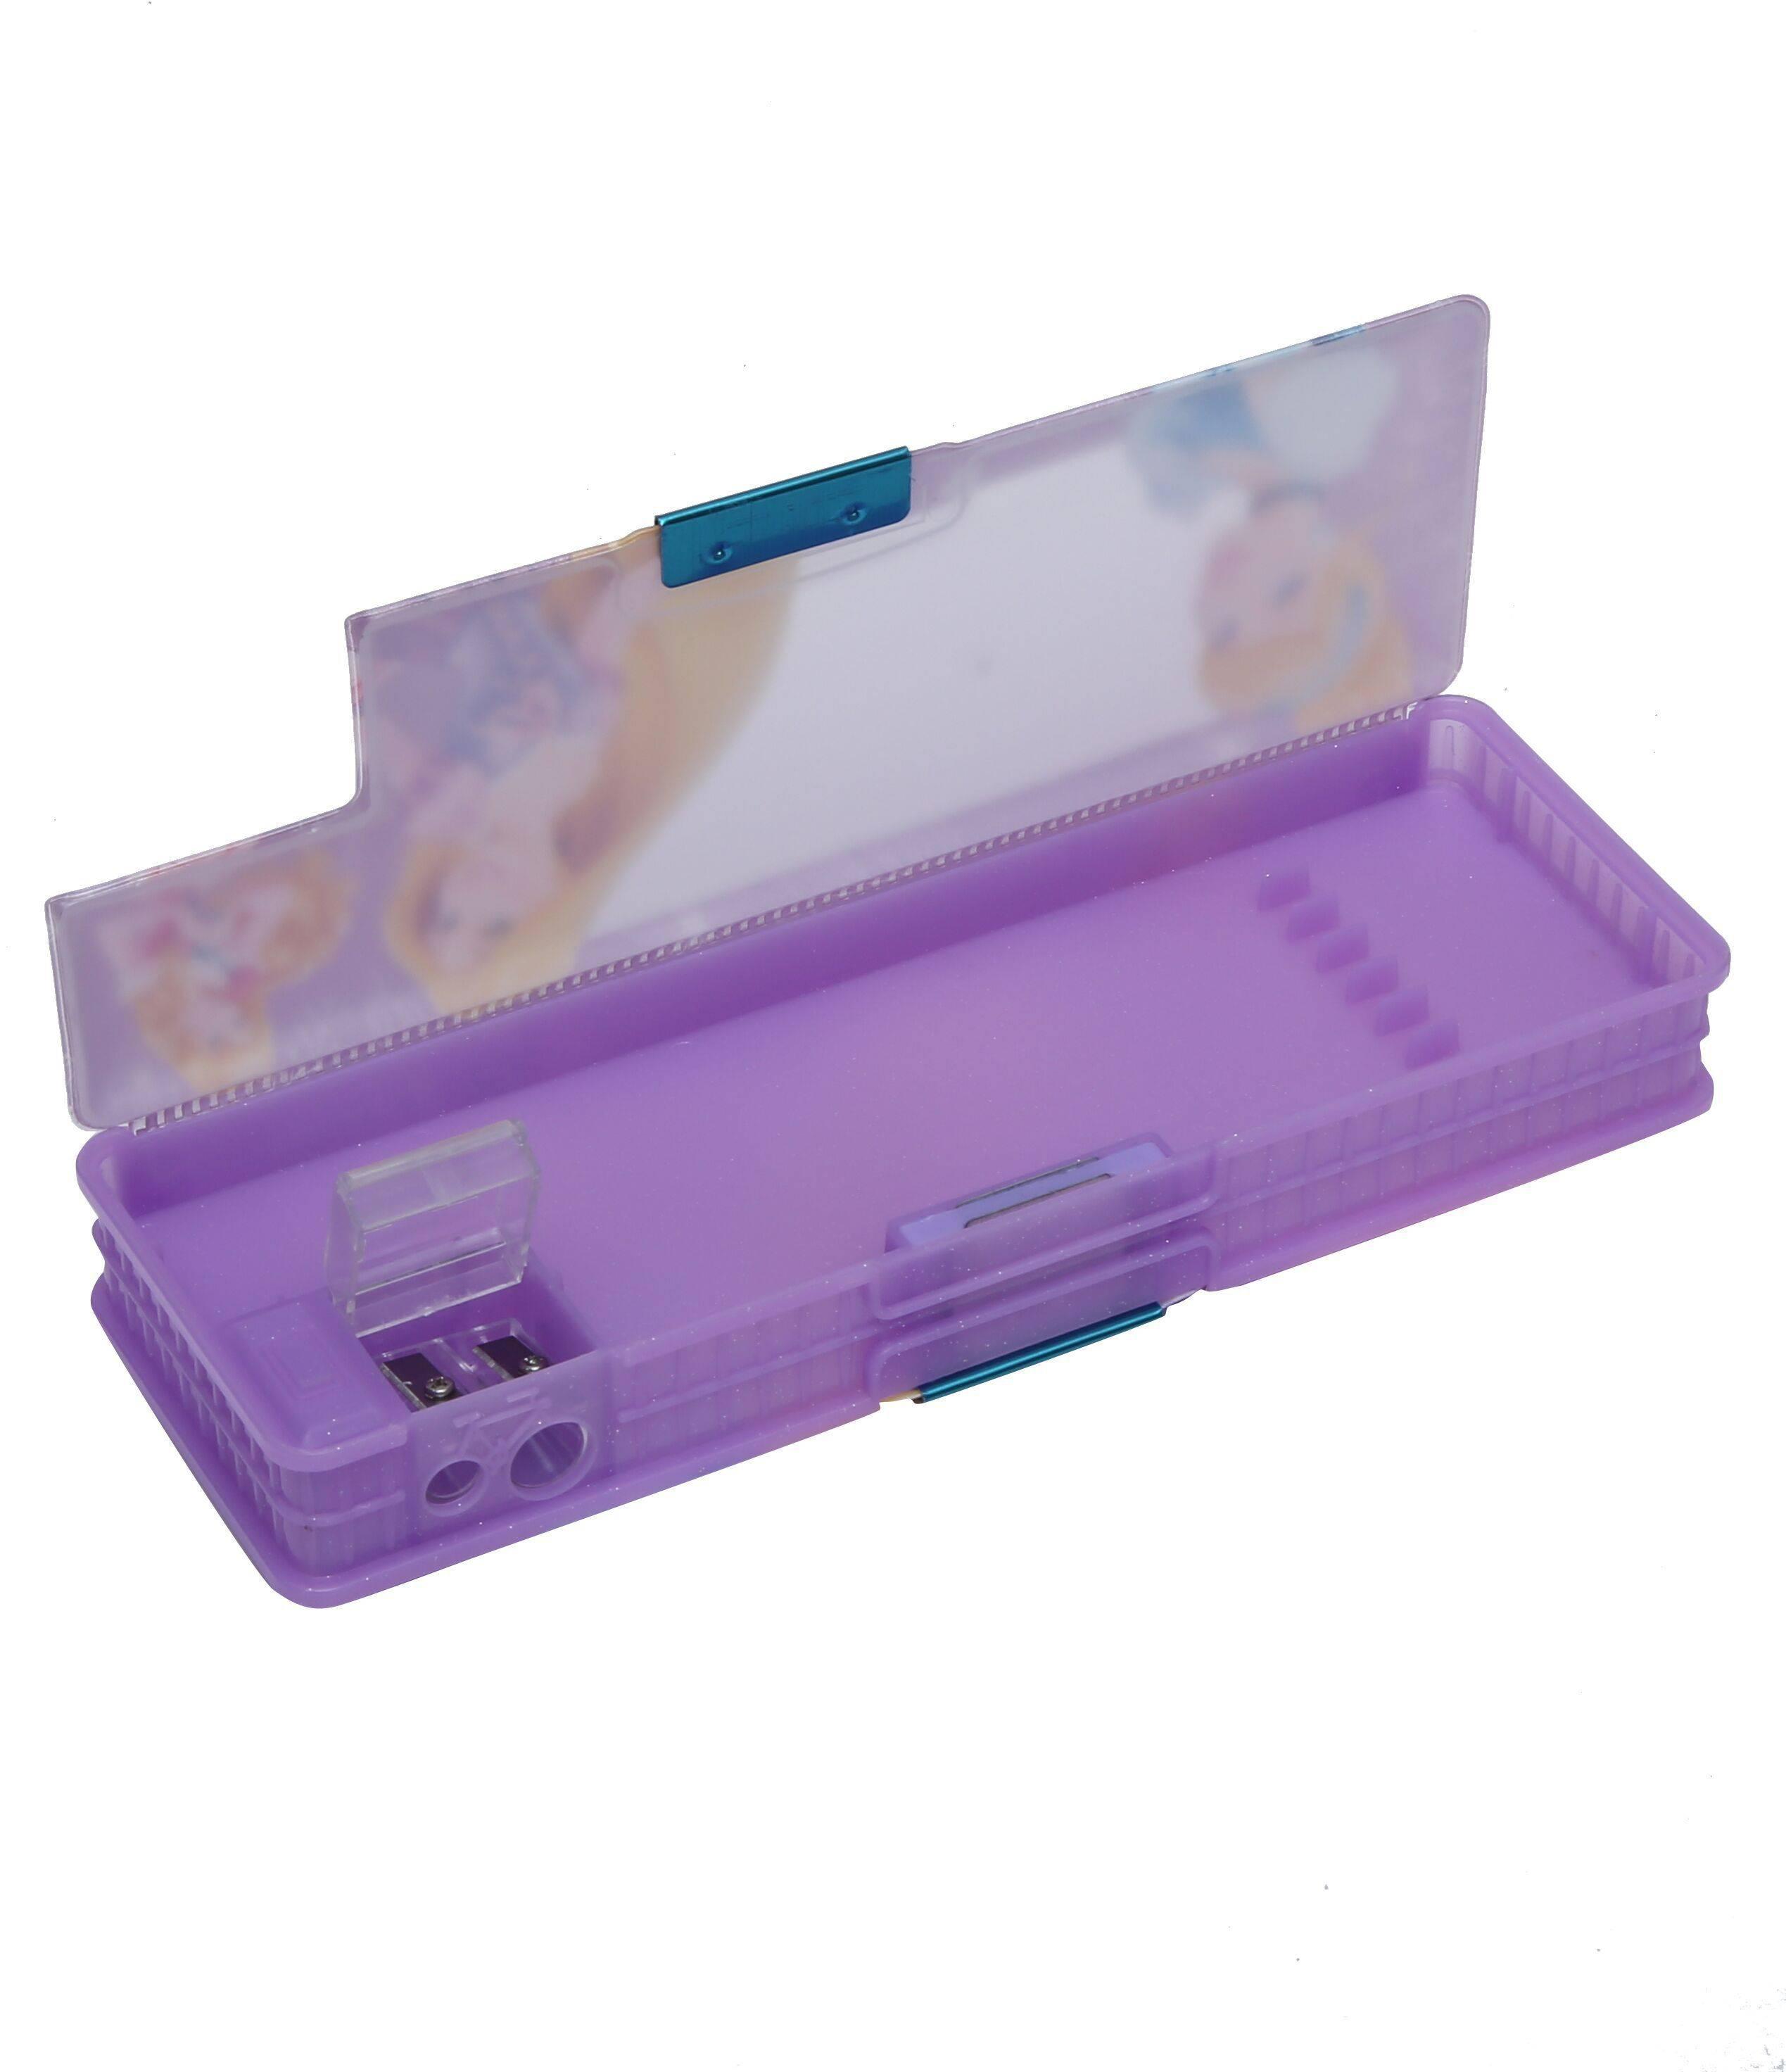 Wimbley disney princess pencil box SDL 3